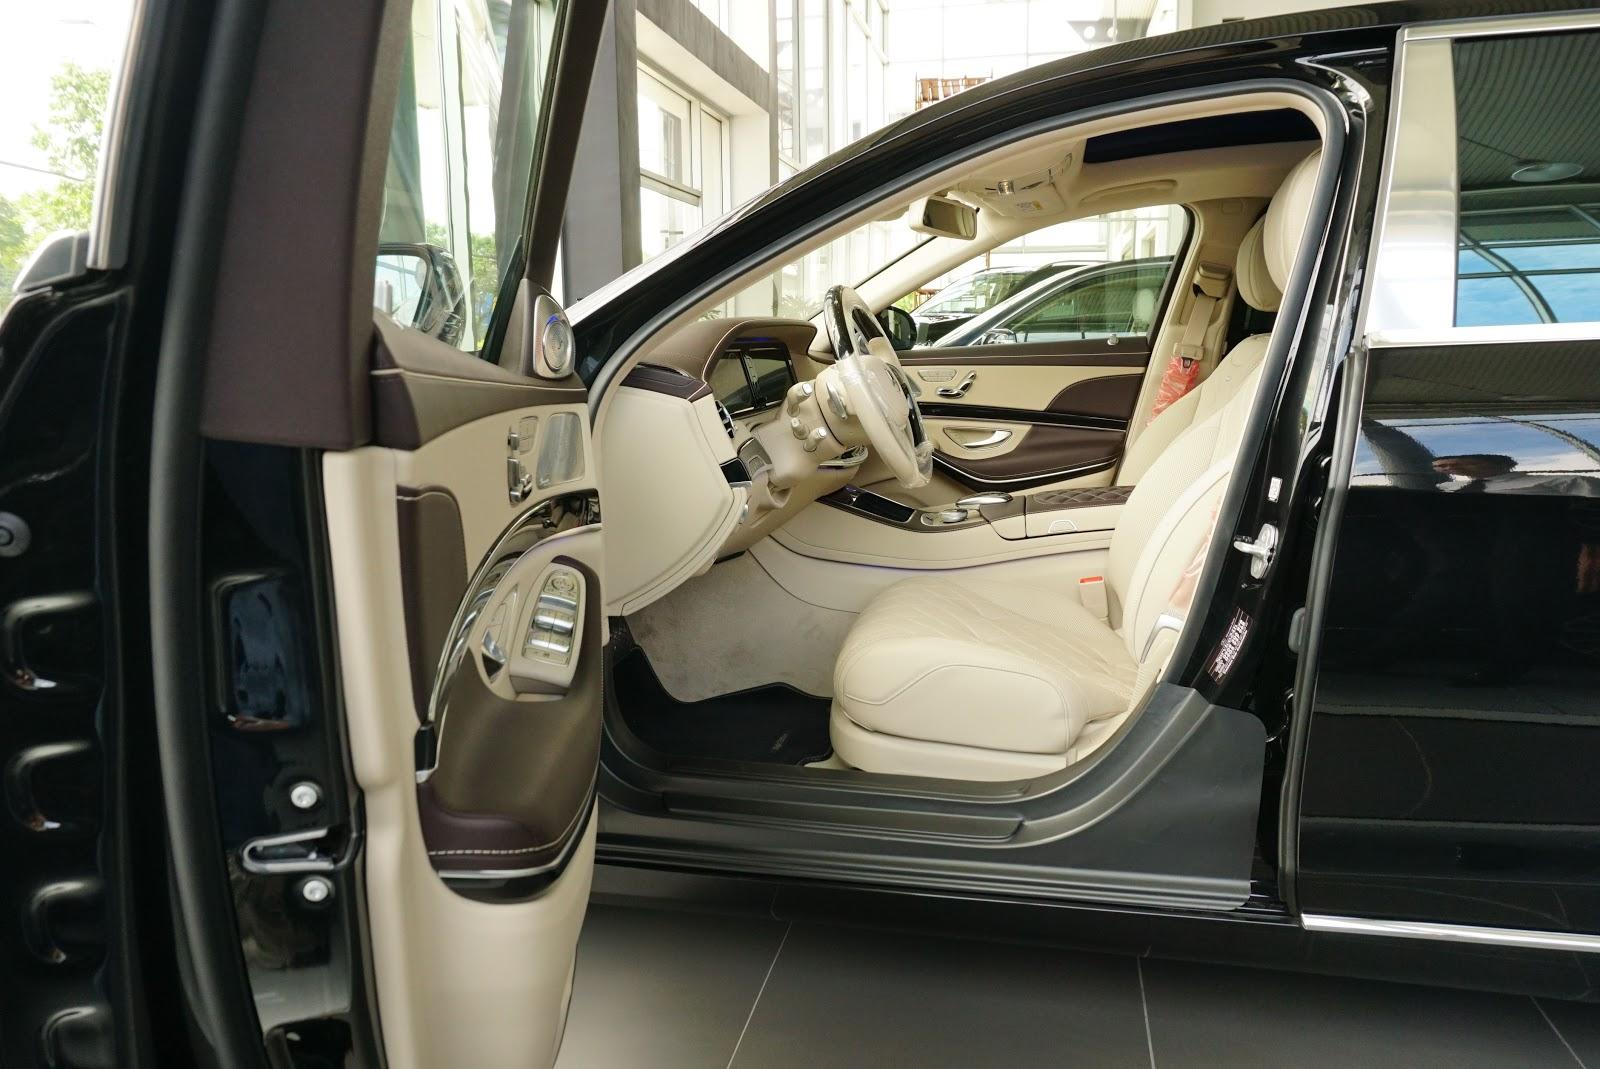 Ngoại Thất Xe Mercedes Benz S600 MAYBACH Màu Đen a08